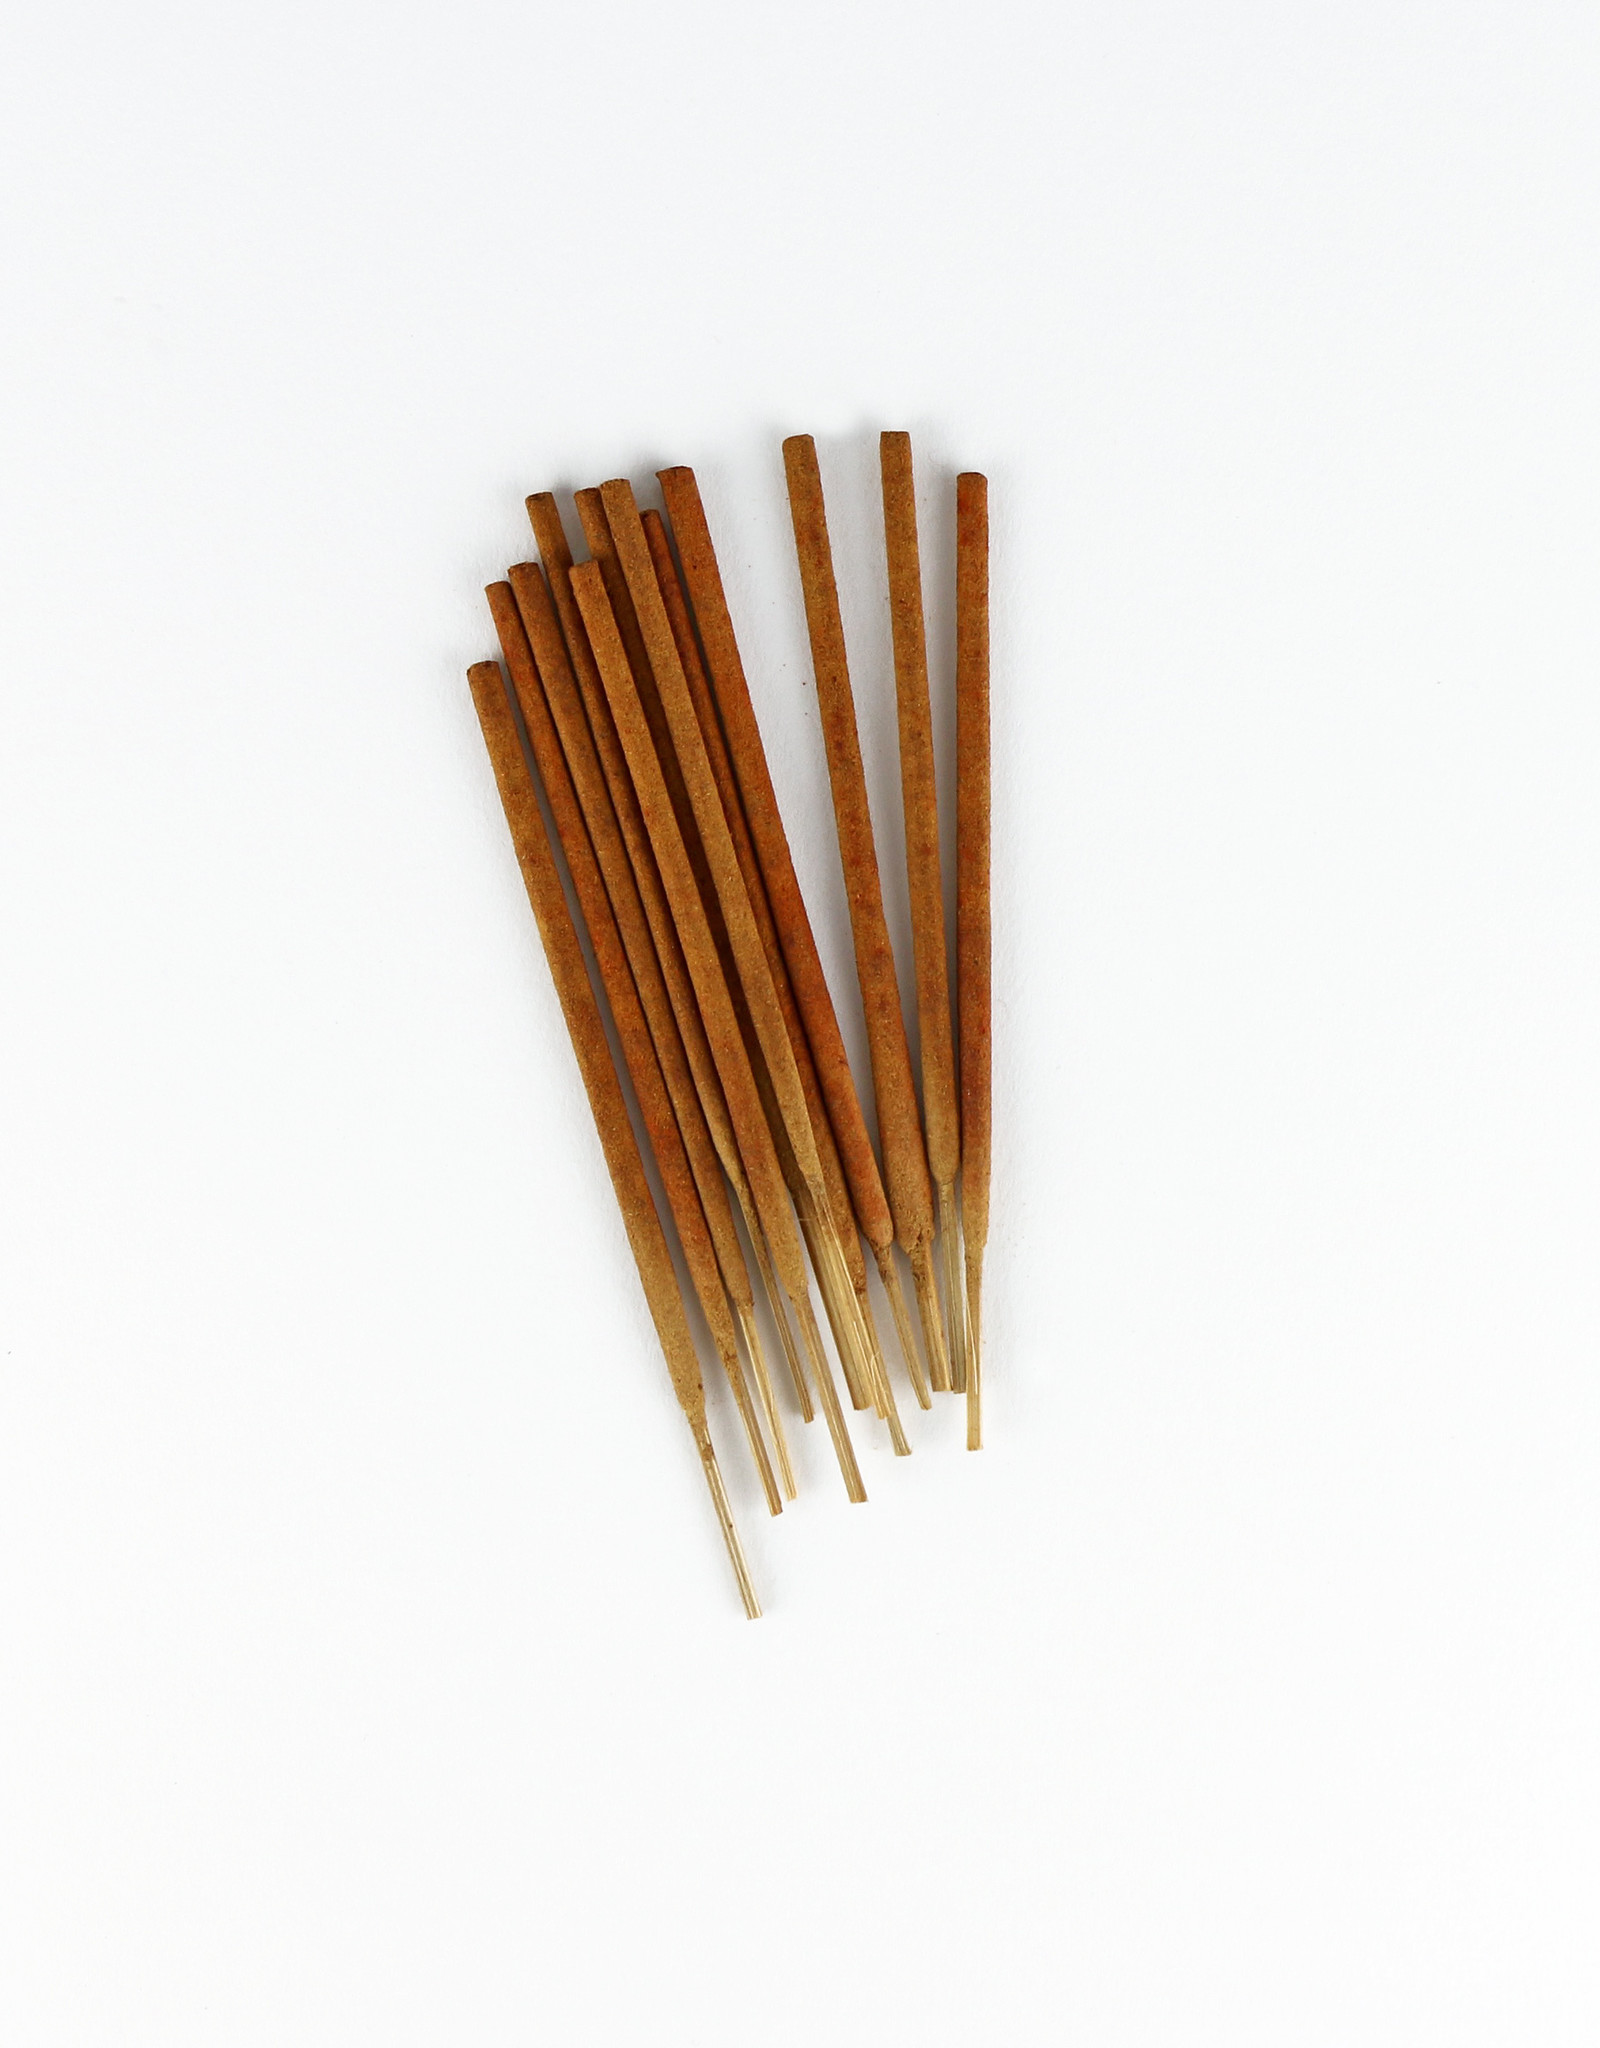 Incense sticks- Myrrh (12 sticks)